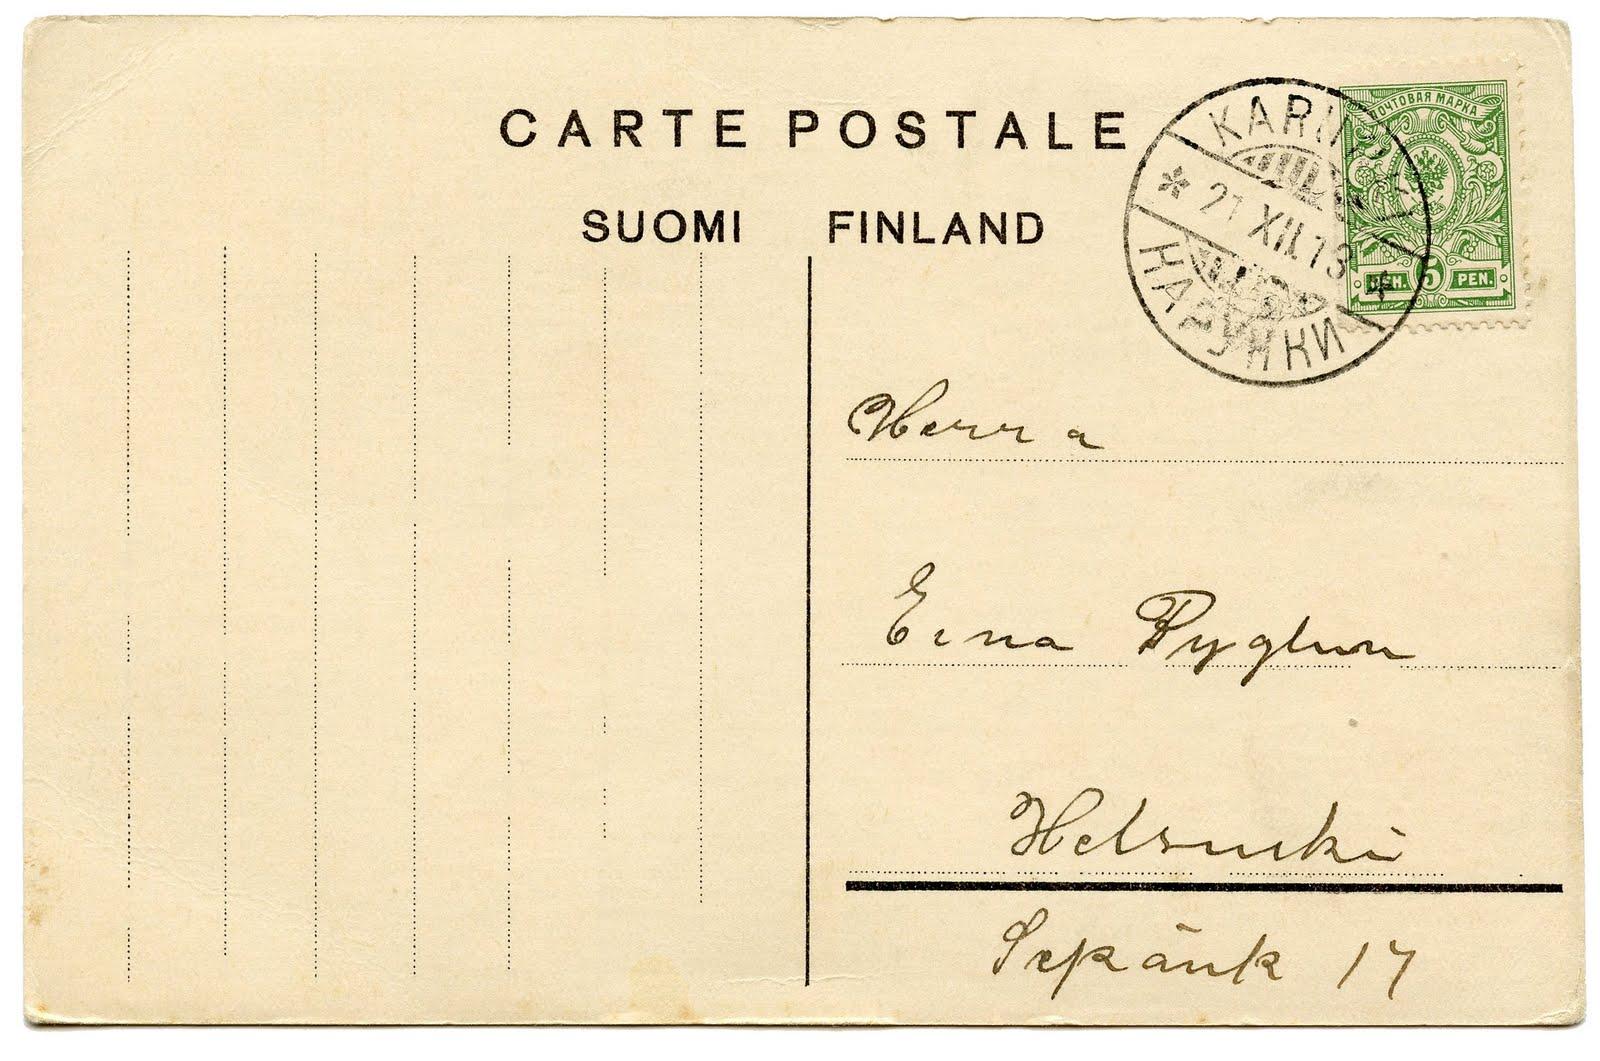 Vintage Clip Art u2013 Darling Snowman P-Vintage Clip Art u2013 Darling Snowman Postcard u2013 Finland-6